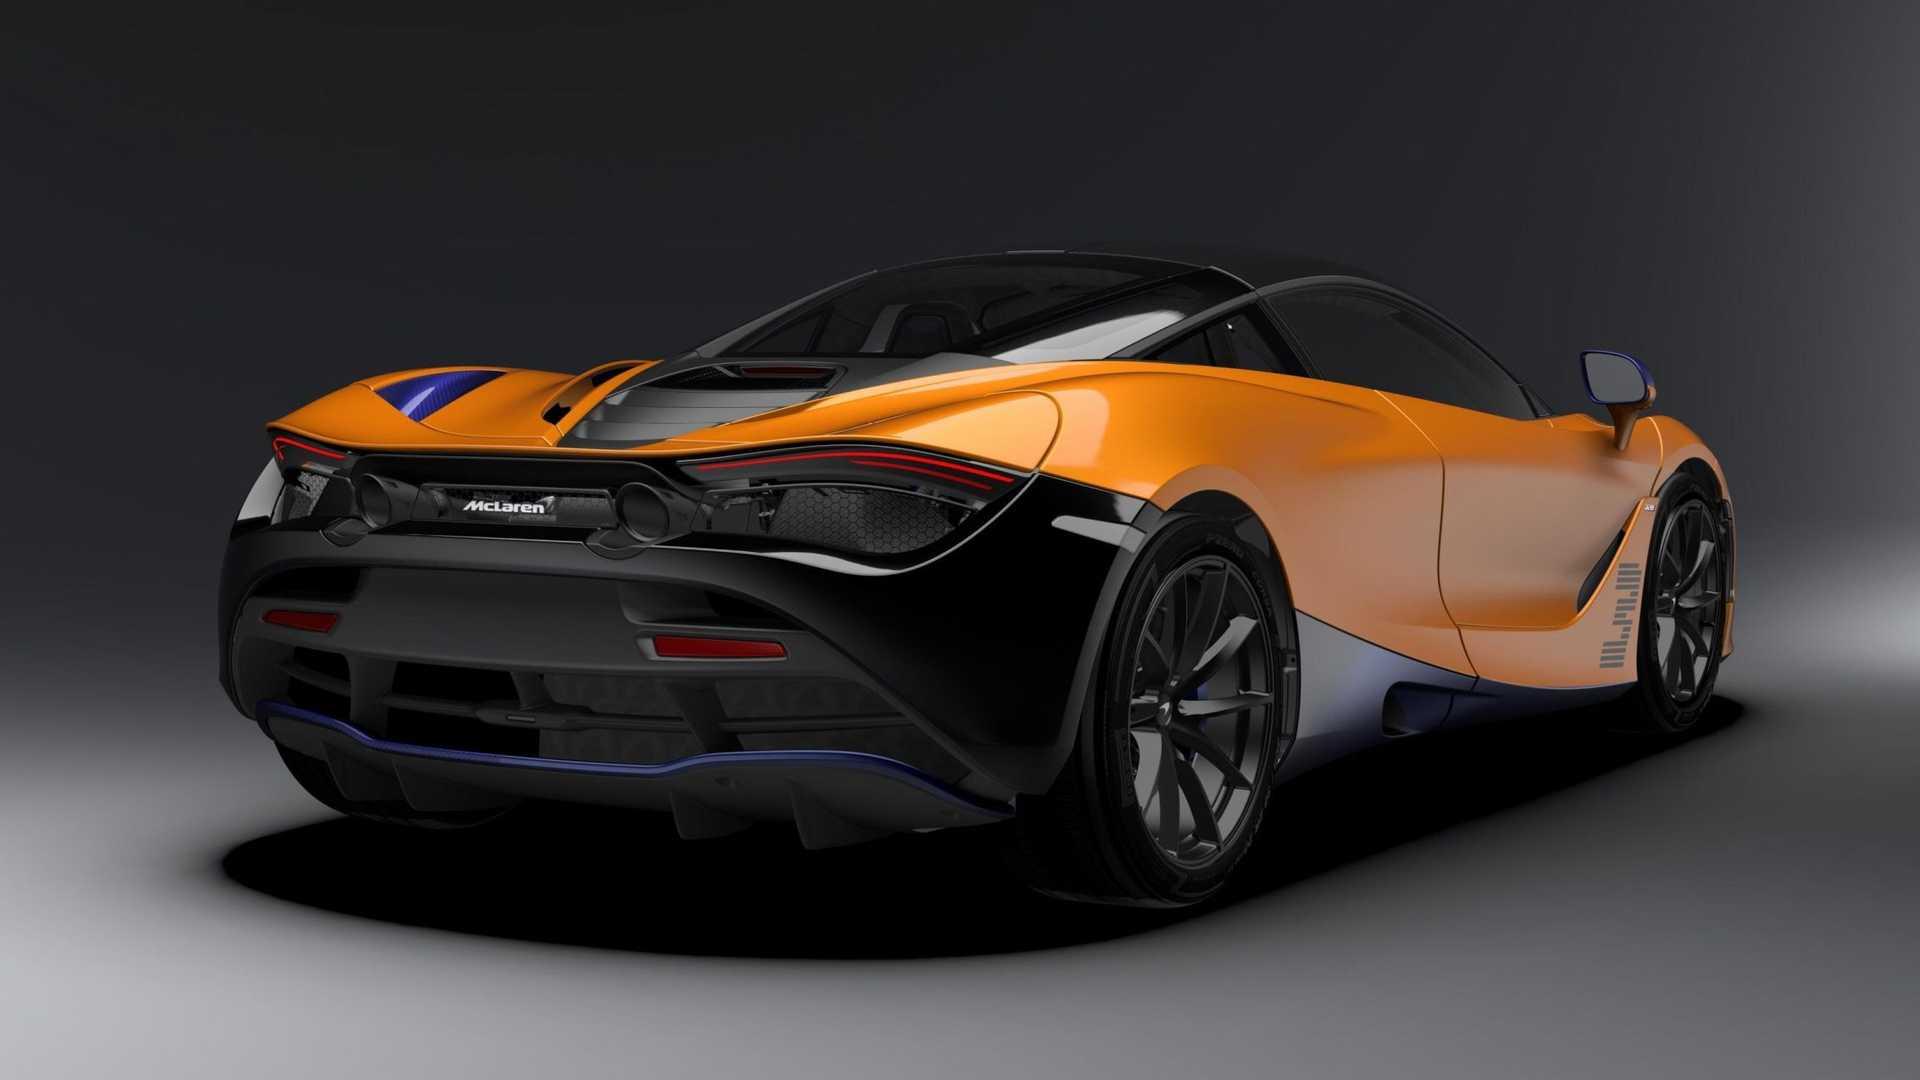 McLaren-720S-Daniel-Ricciardo-Edition-2